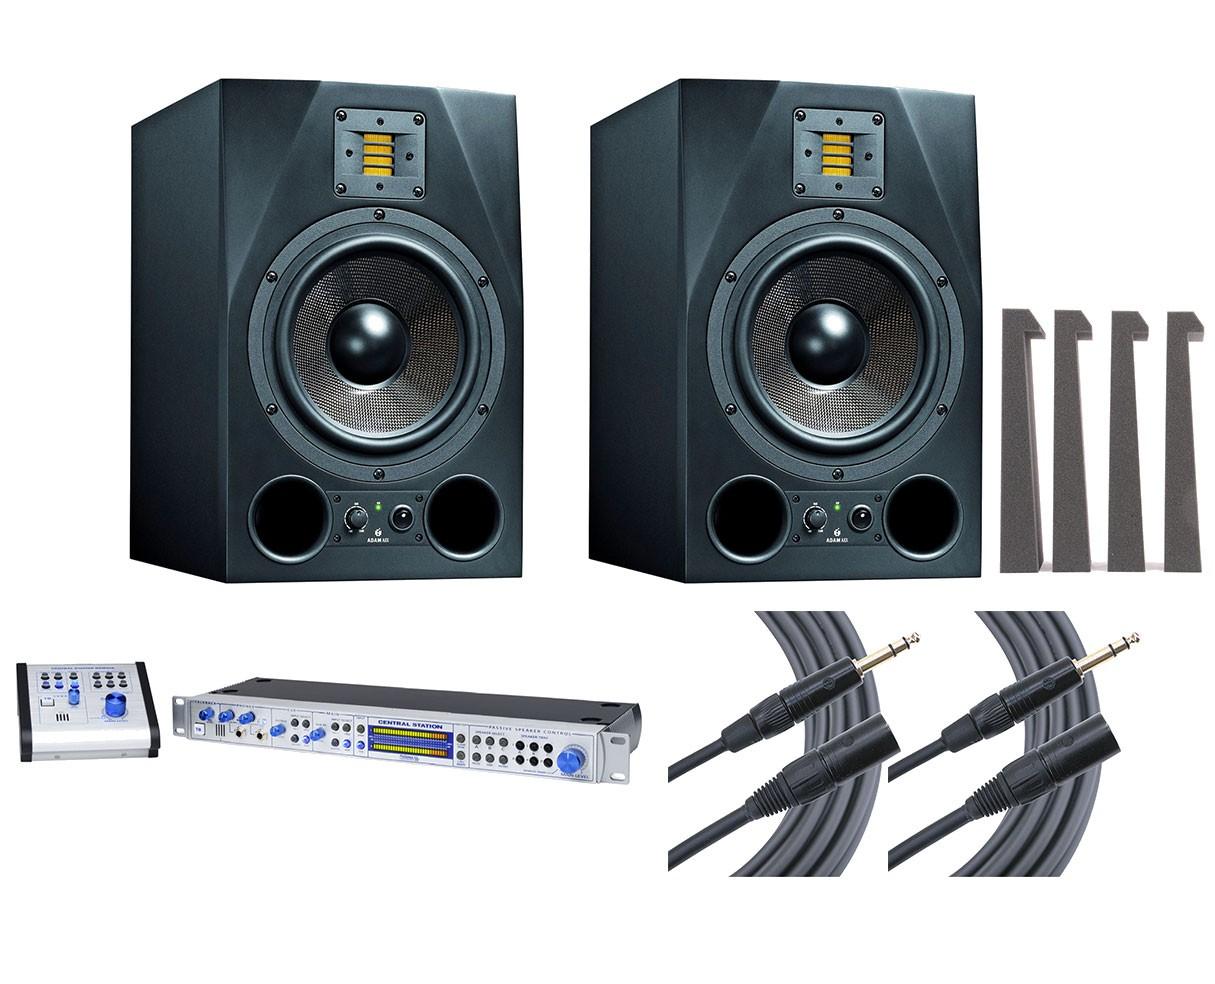 2x ADAM A8X + Central Station PLUS + MoPADs + Mogami Cables